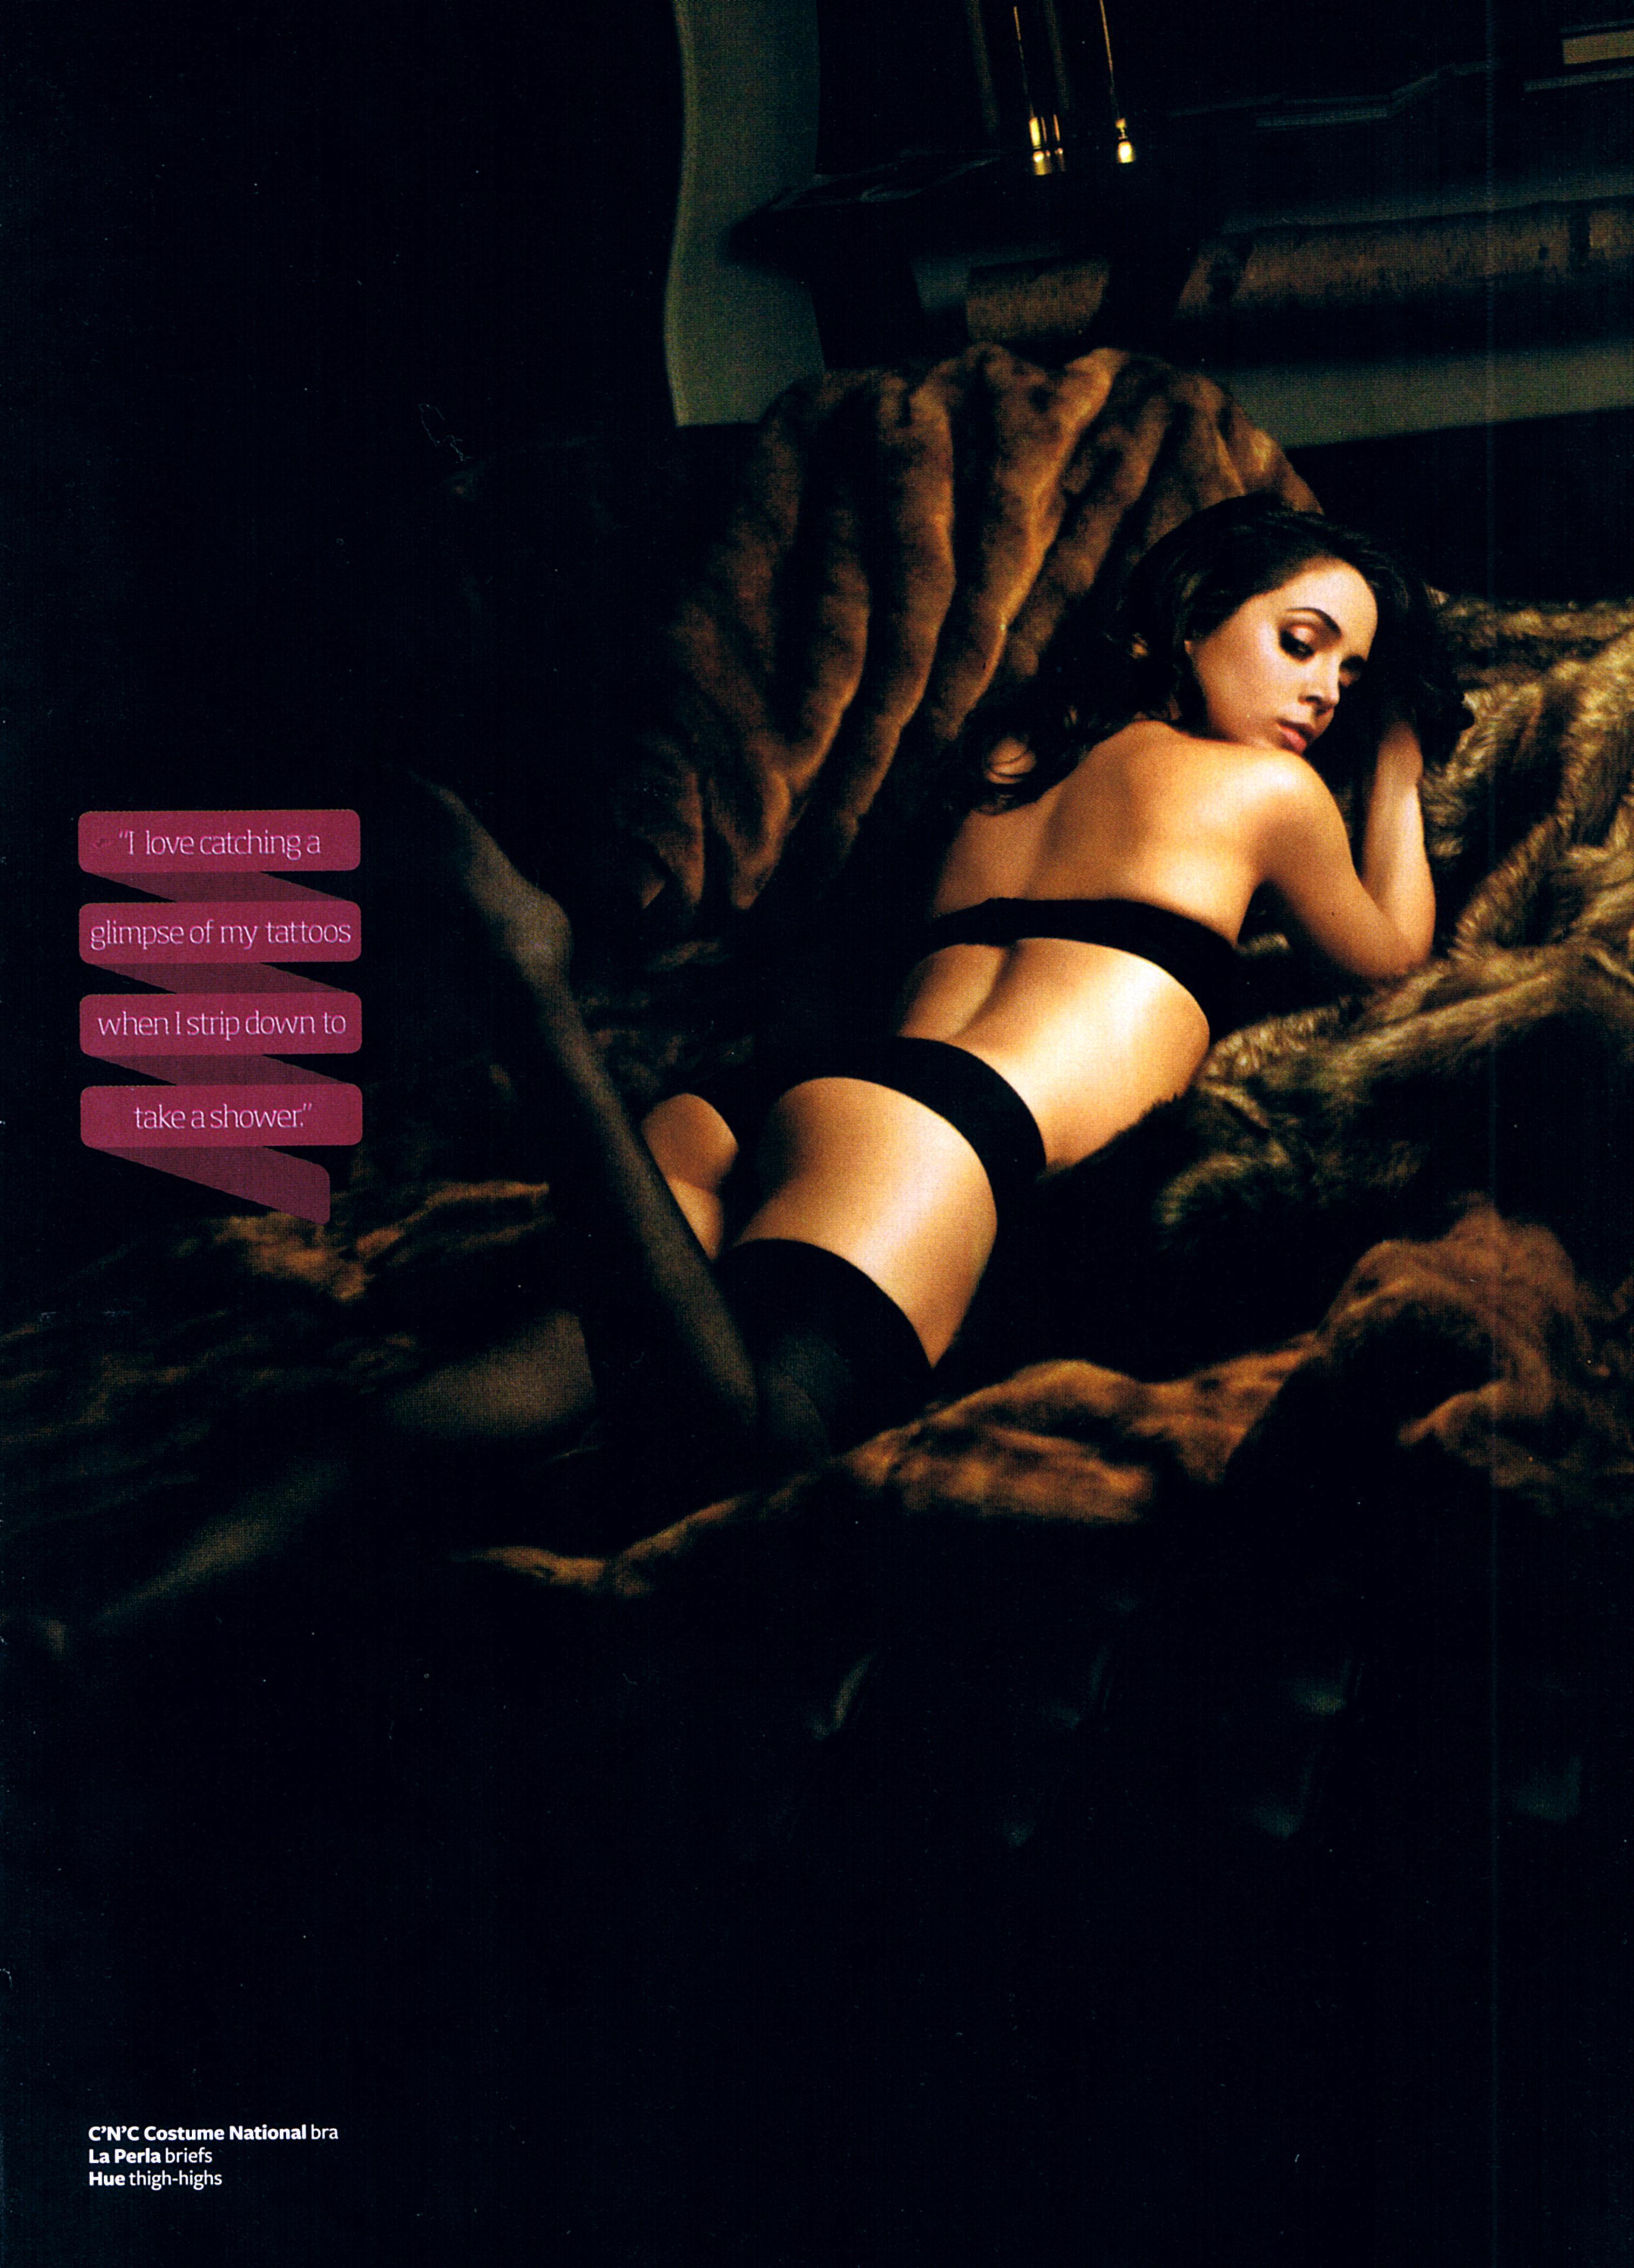 fotos de Eliza Dushku desnuda